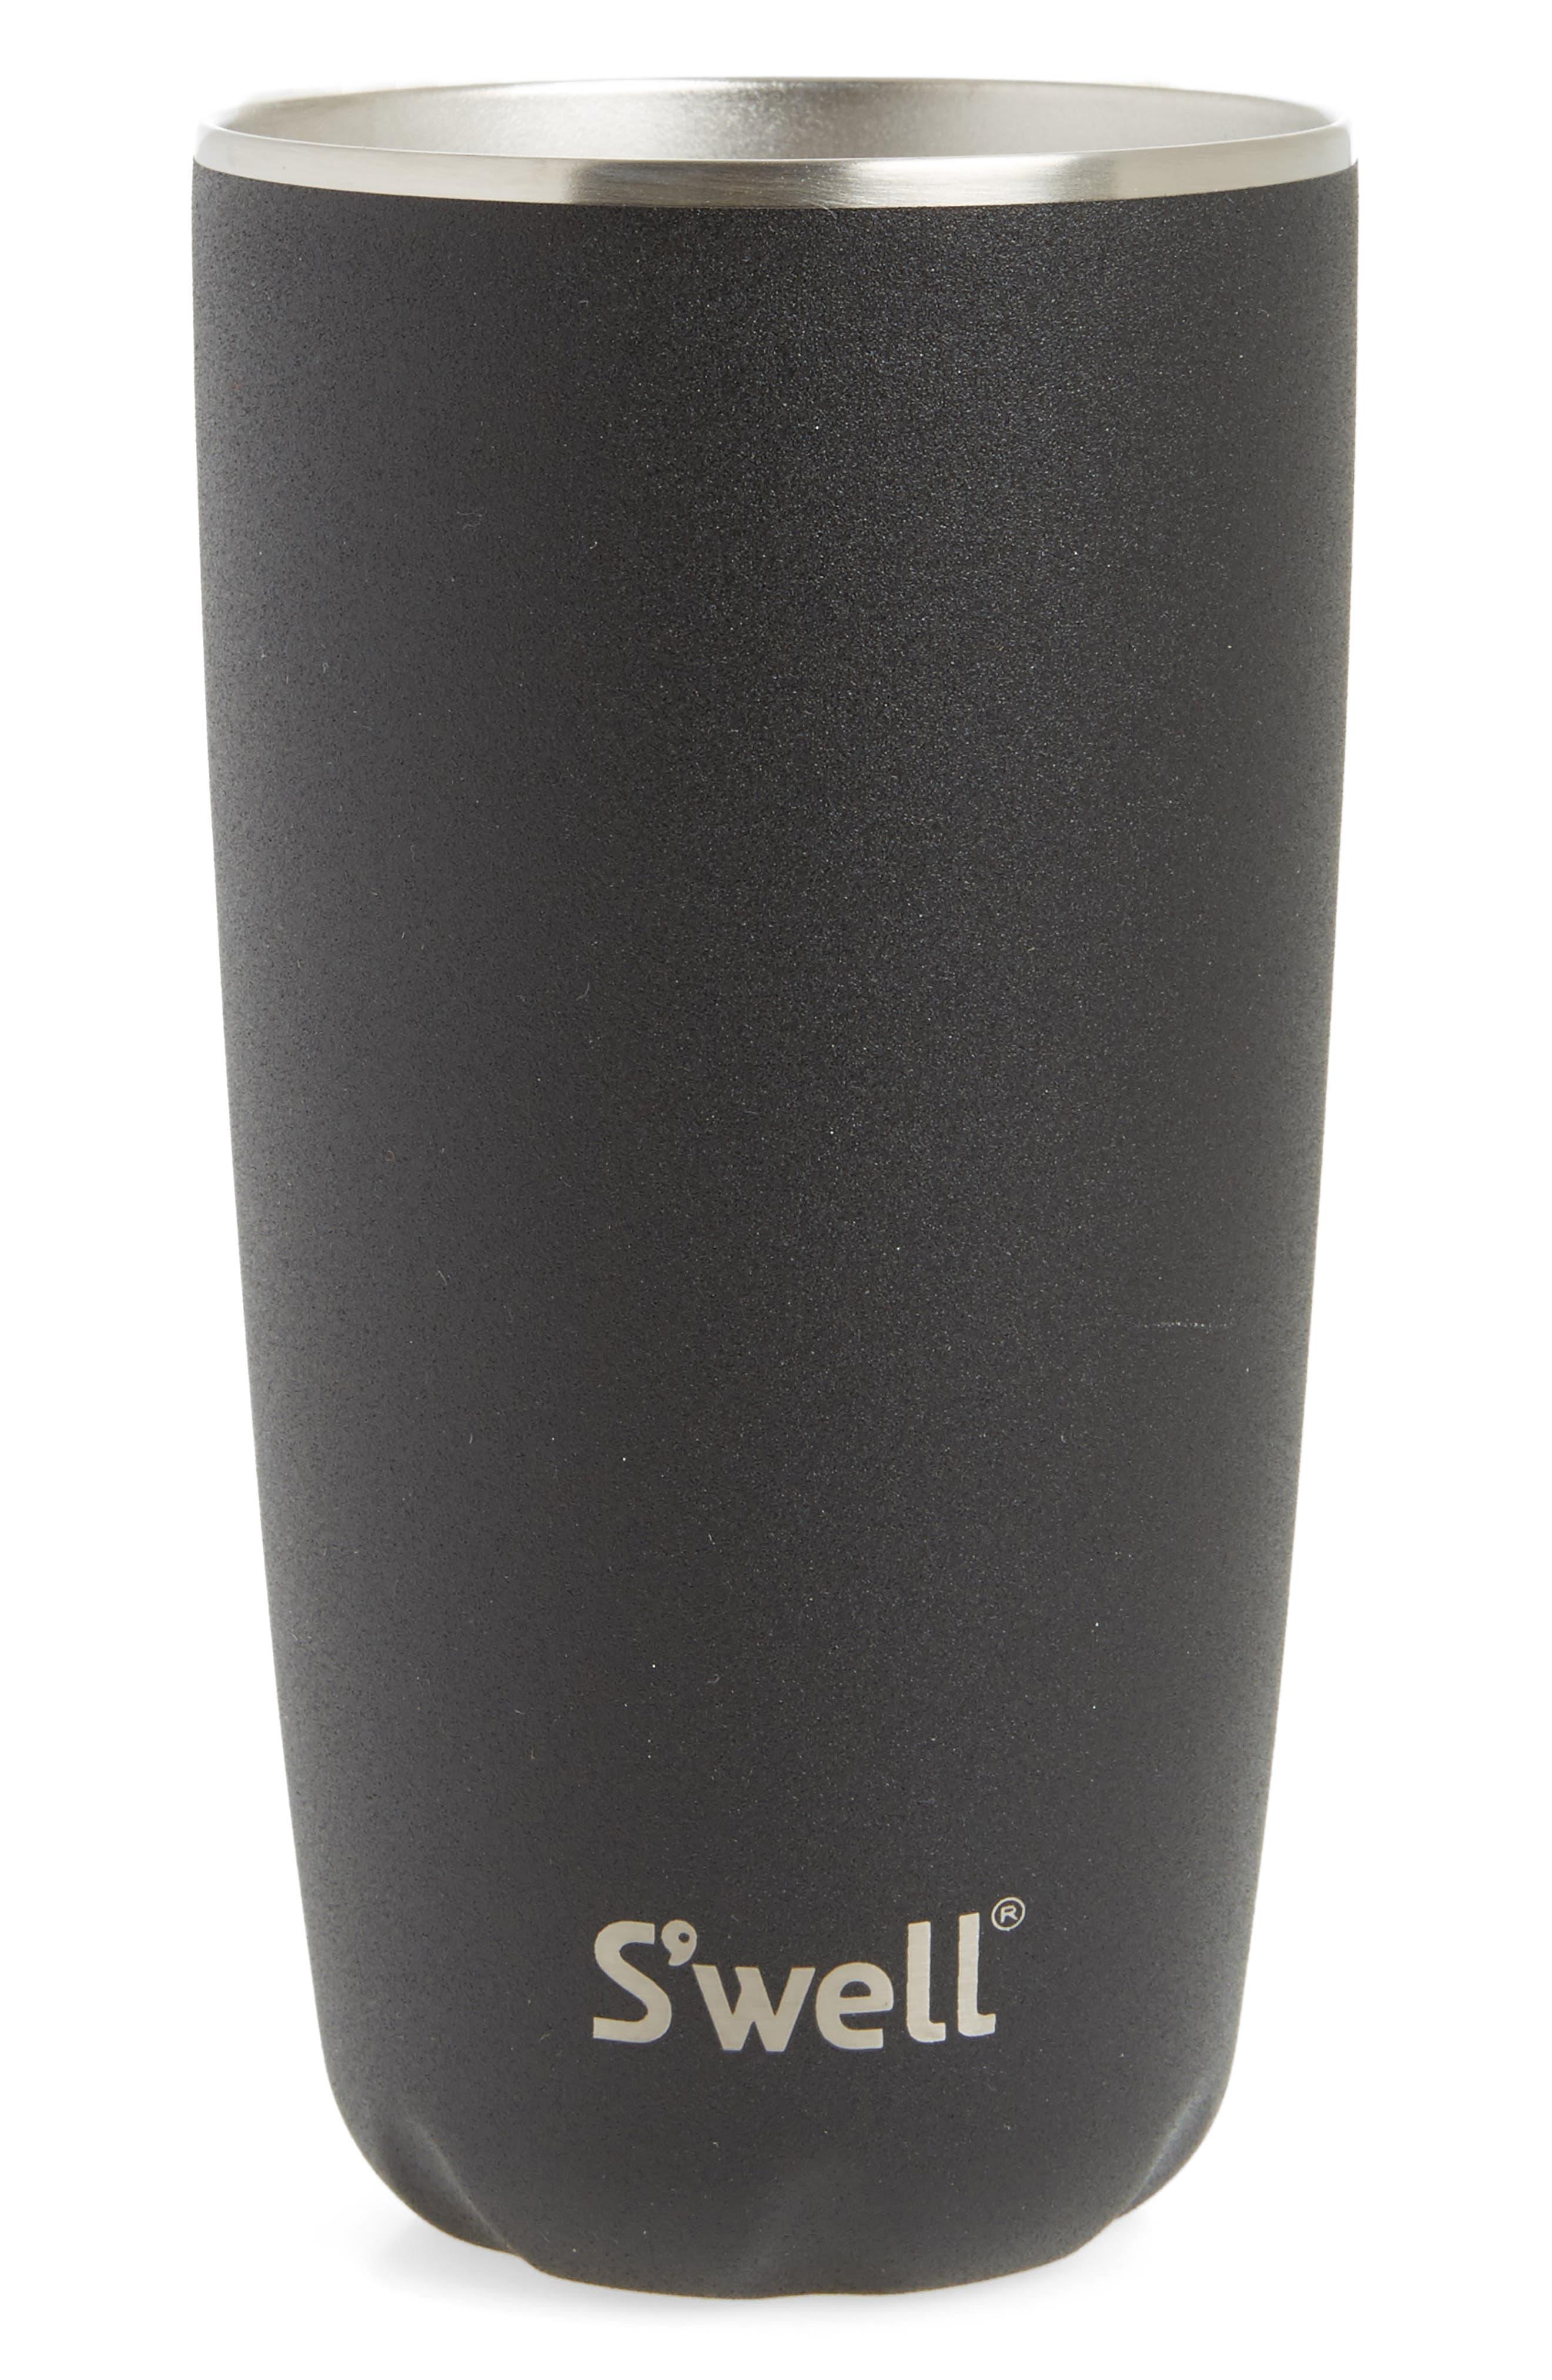 S'well Onyx 16-Ounce Insulated Tumbler